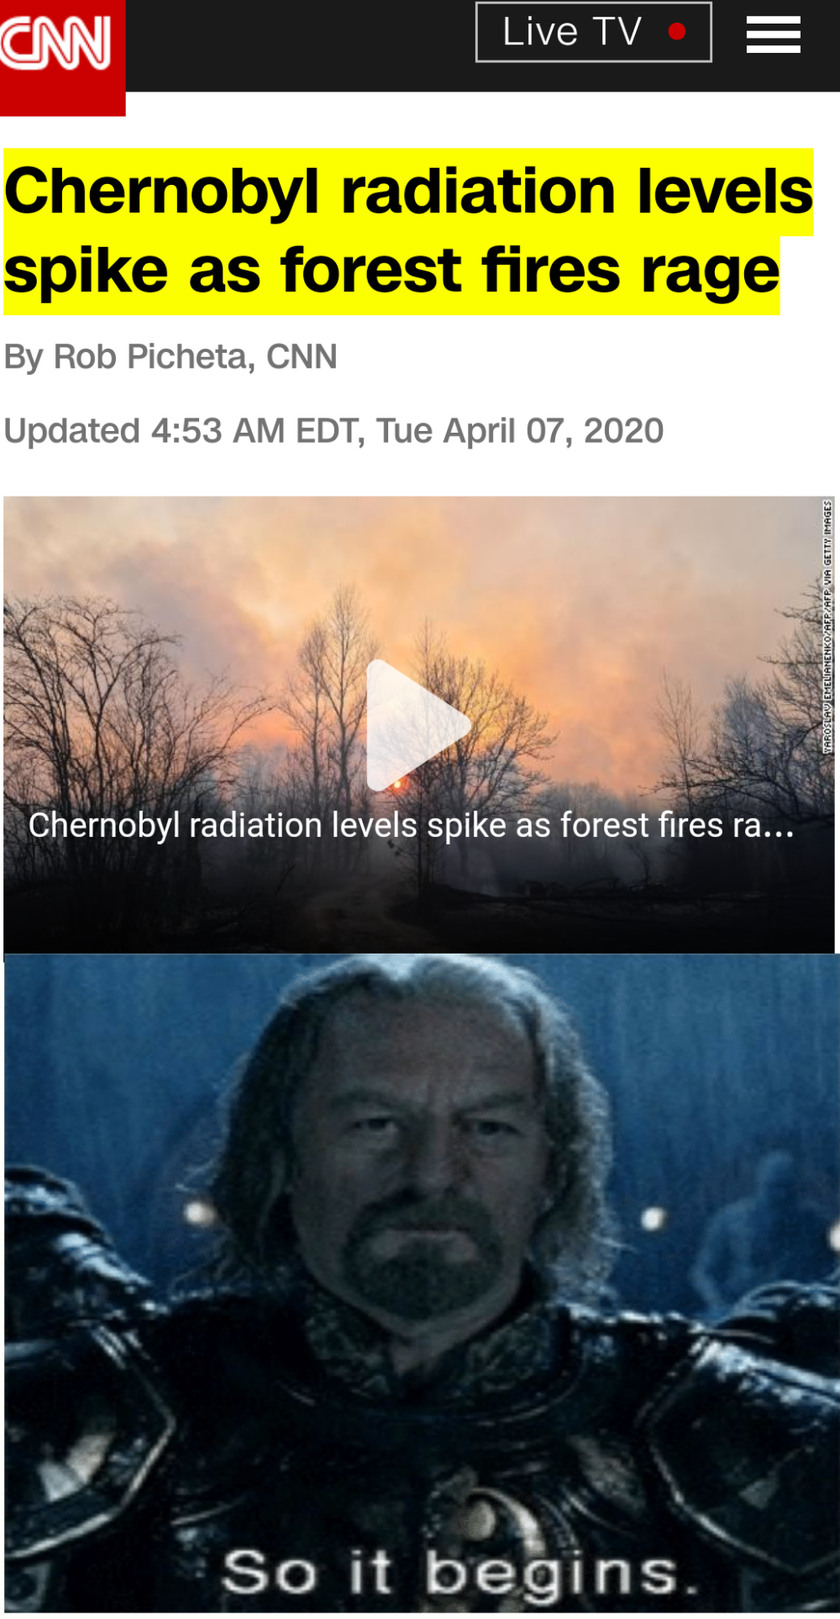 We've missed it, guys. It's already here - meme